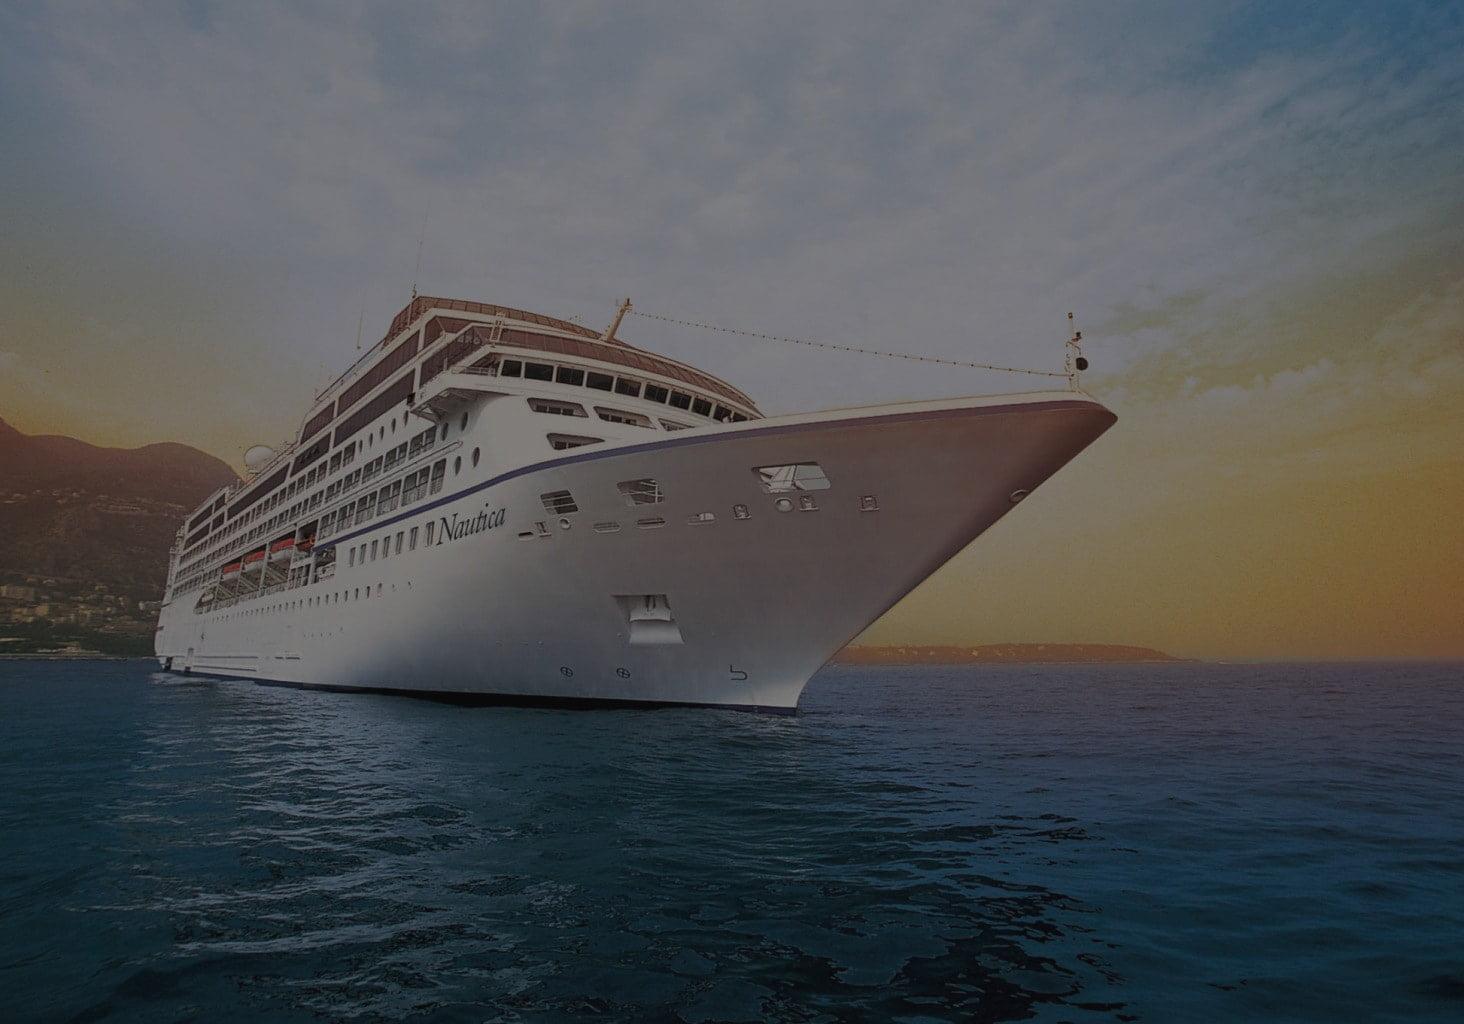 The Bourbon Cruise